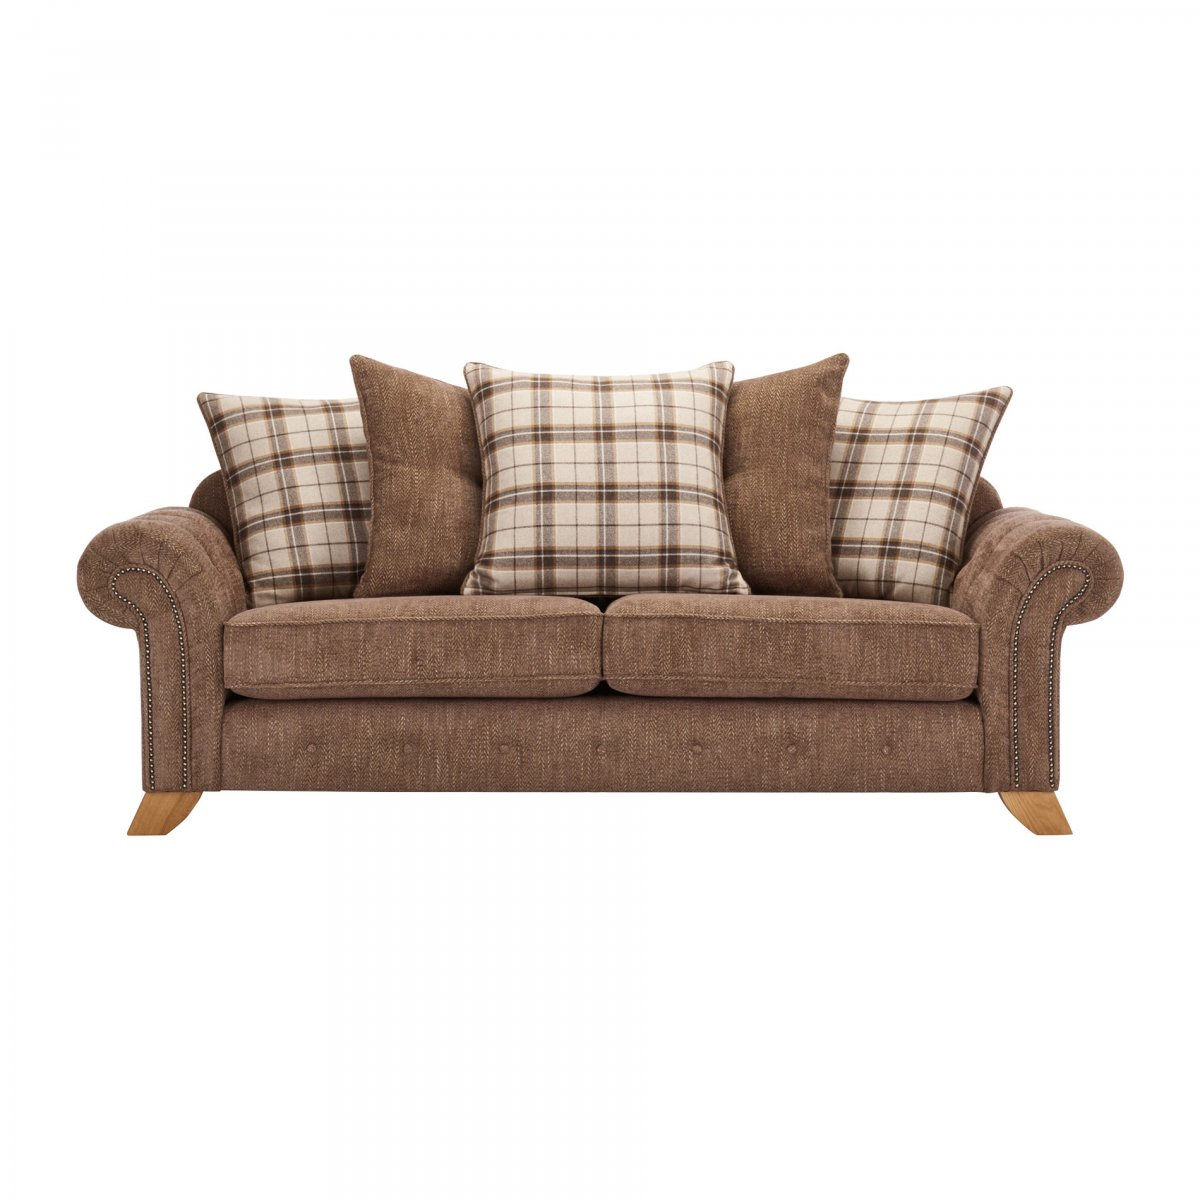 Montana 3 Seater Pillow Back Sofa in Brown  Tartan Cushions